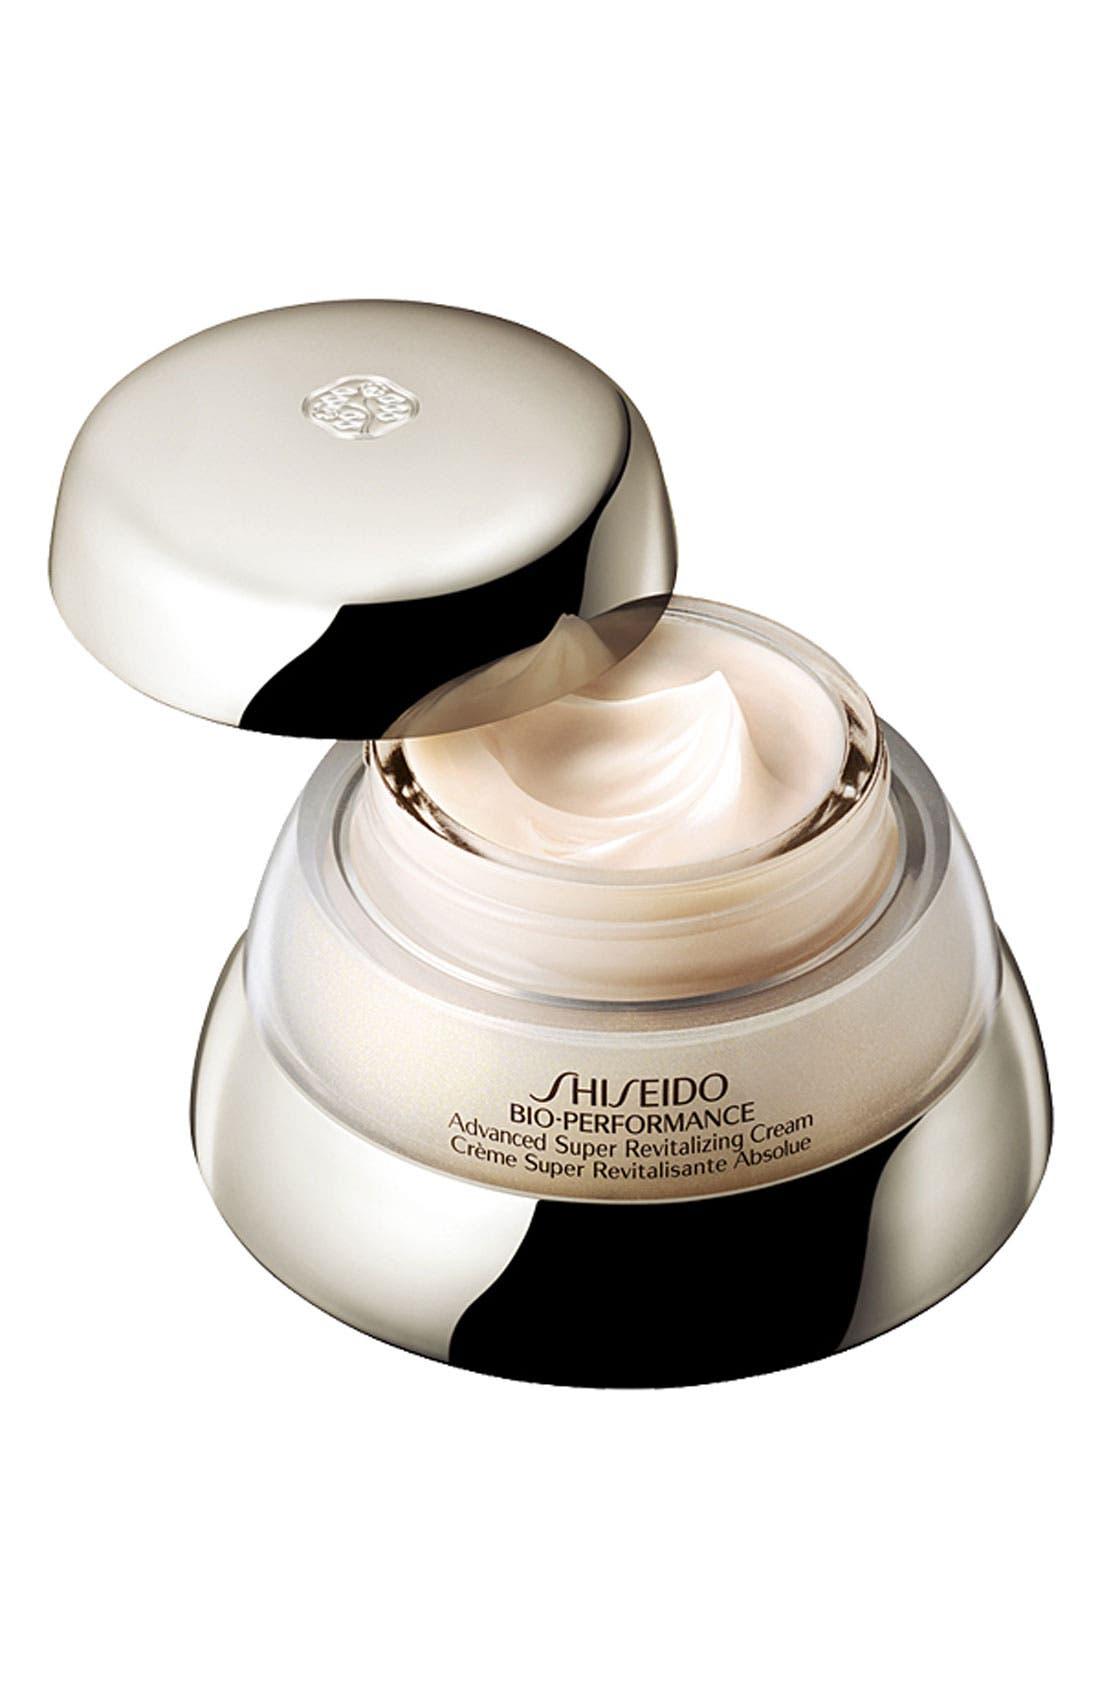 Shiseido 'Bio-Performance' Advance Super Revitalizing Cream